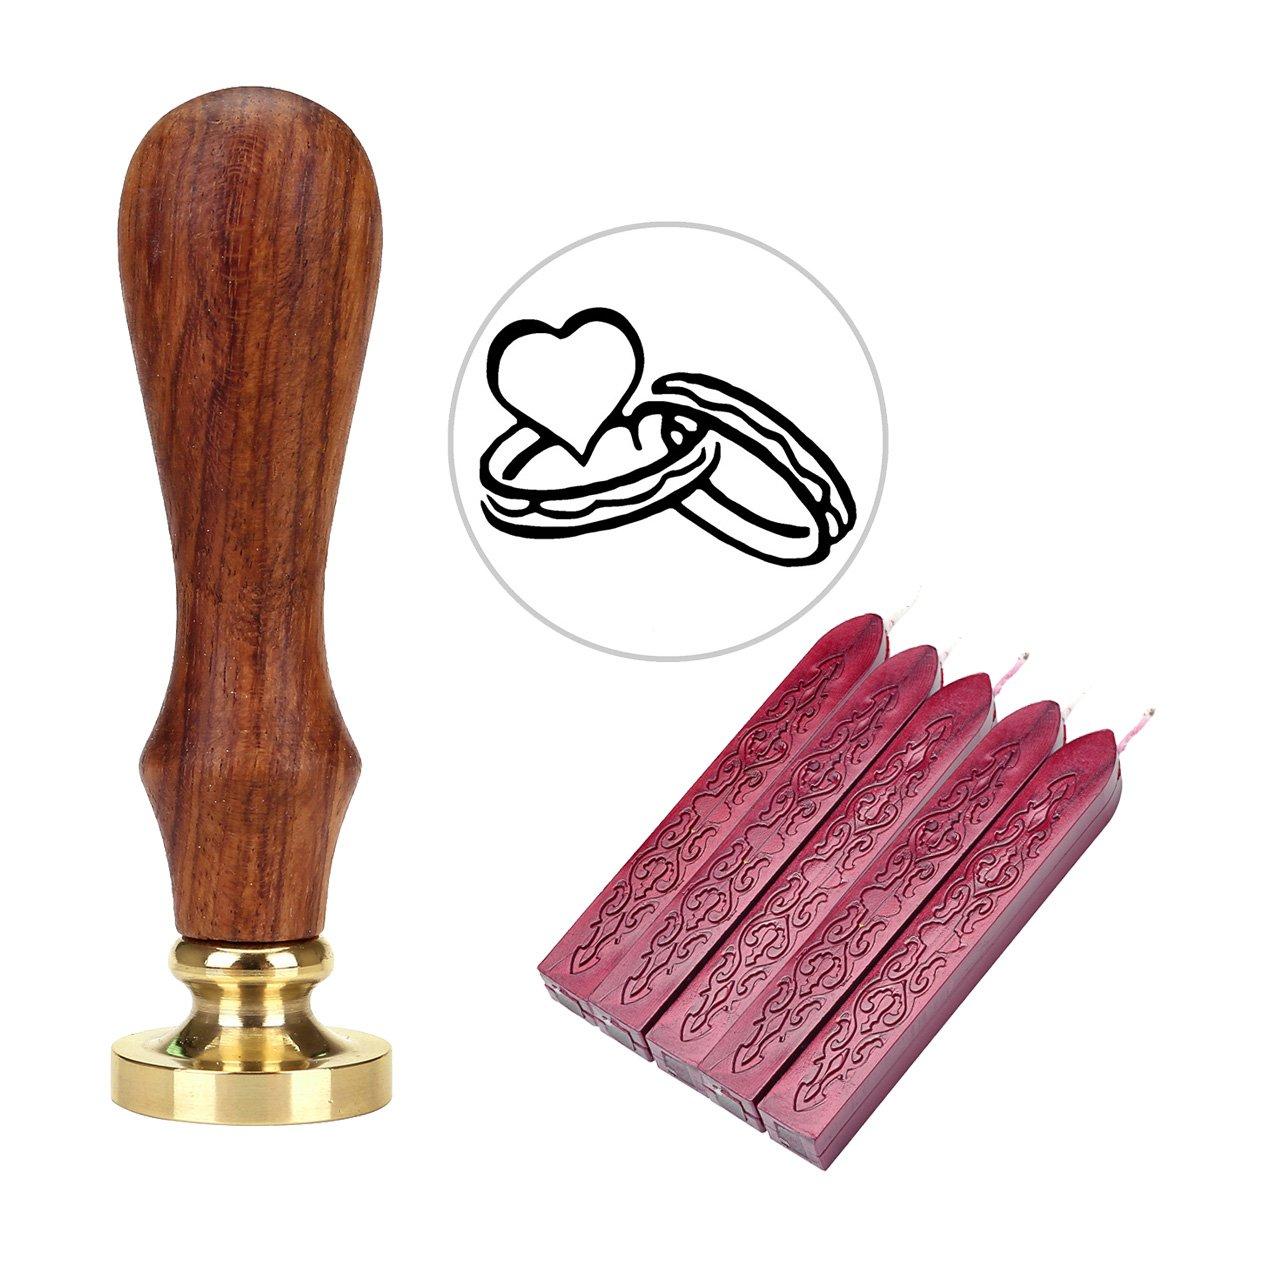 5 Stangen Dunkle Wein Rot Siegelwachs Mogoko Rosenholz achs Siegelstempel Stempel mit Gravur Herz incl